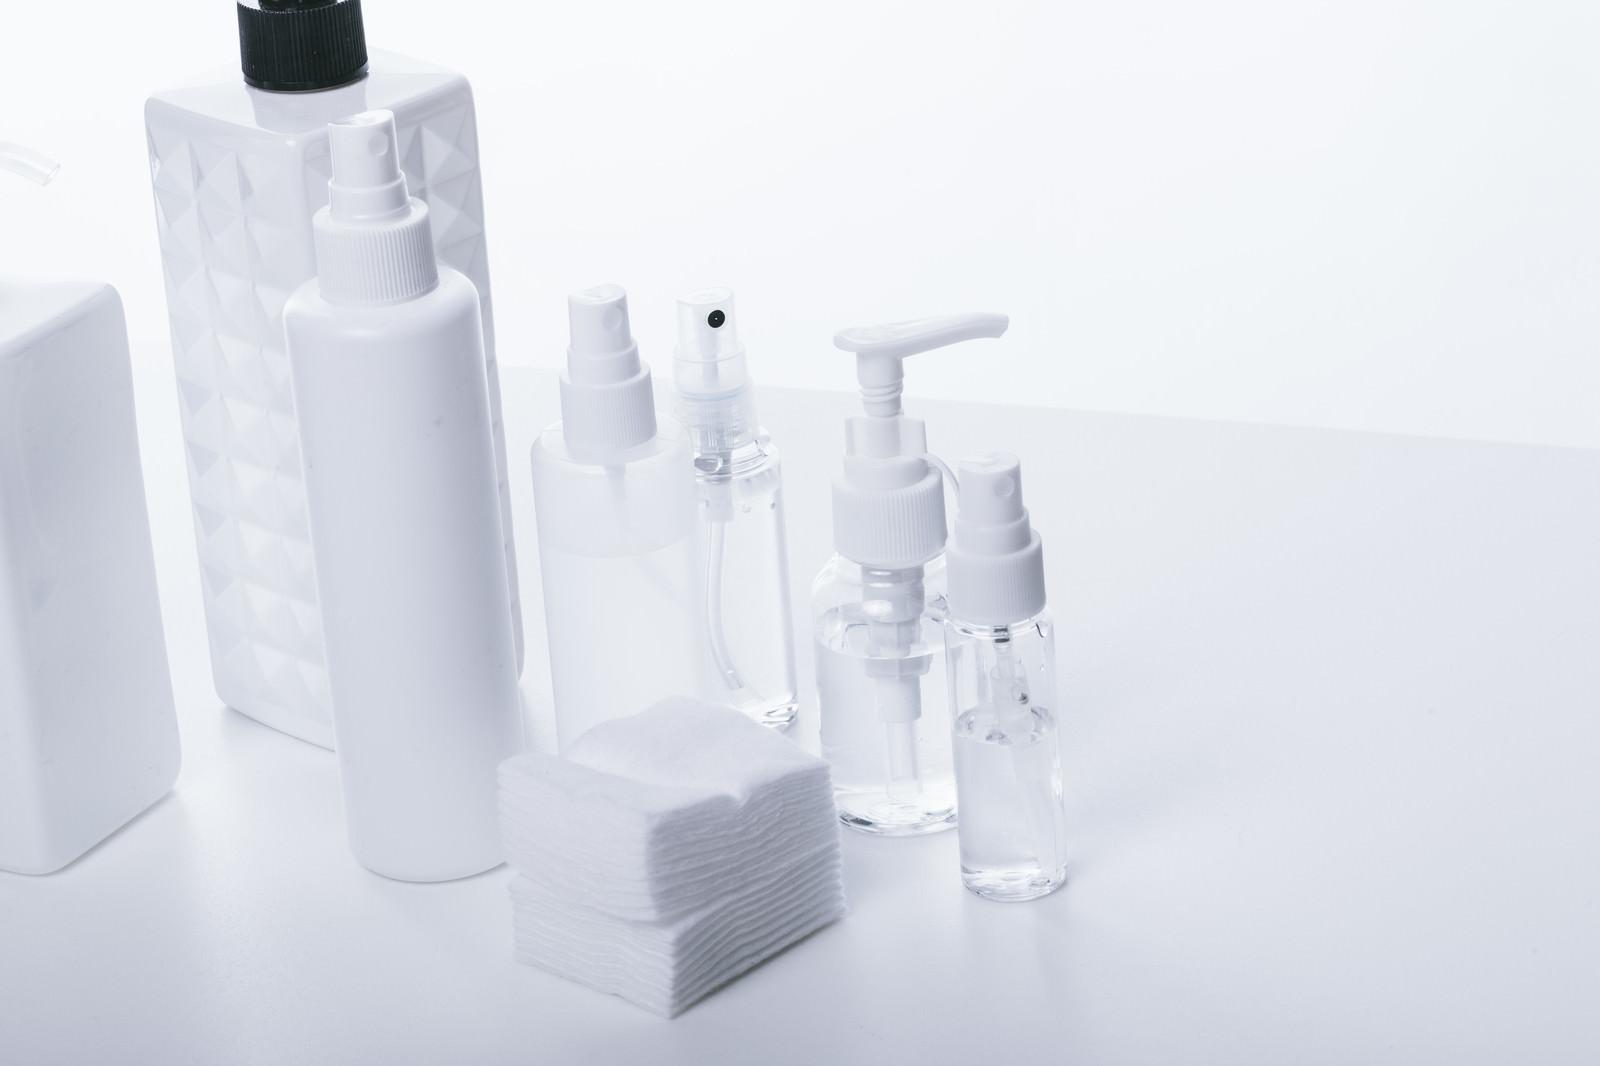 「化粧水容器(透明・乳白色)化粧水容器(透明・乳白色)」のフリー写真素材を拡大